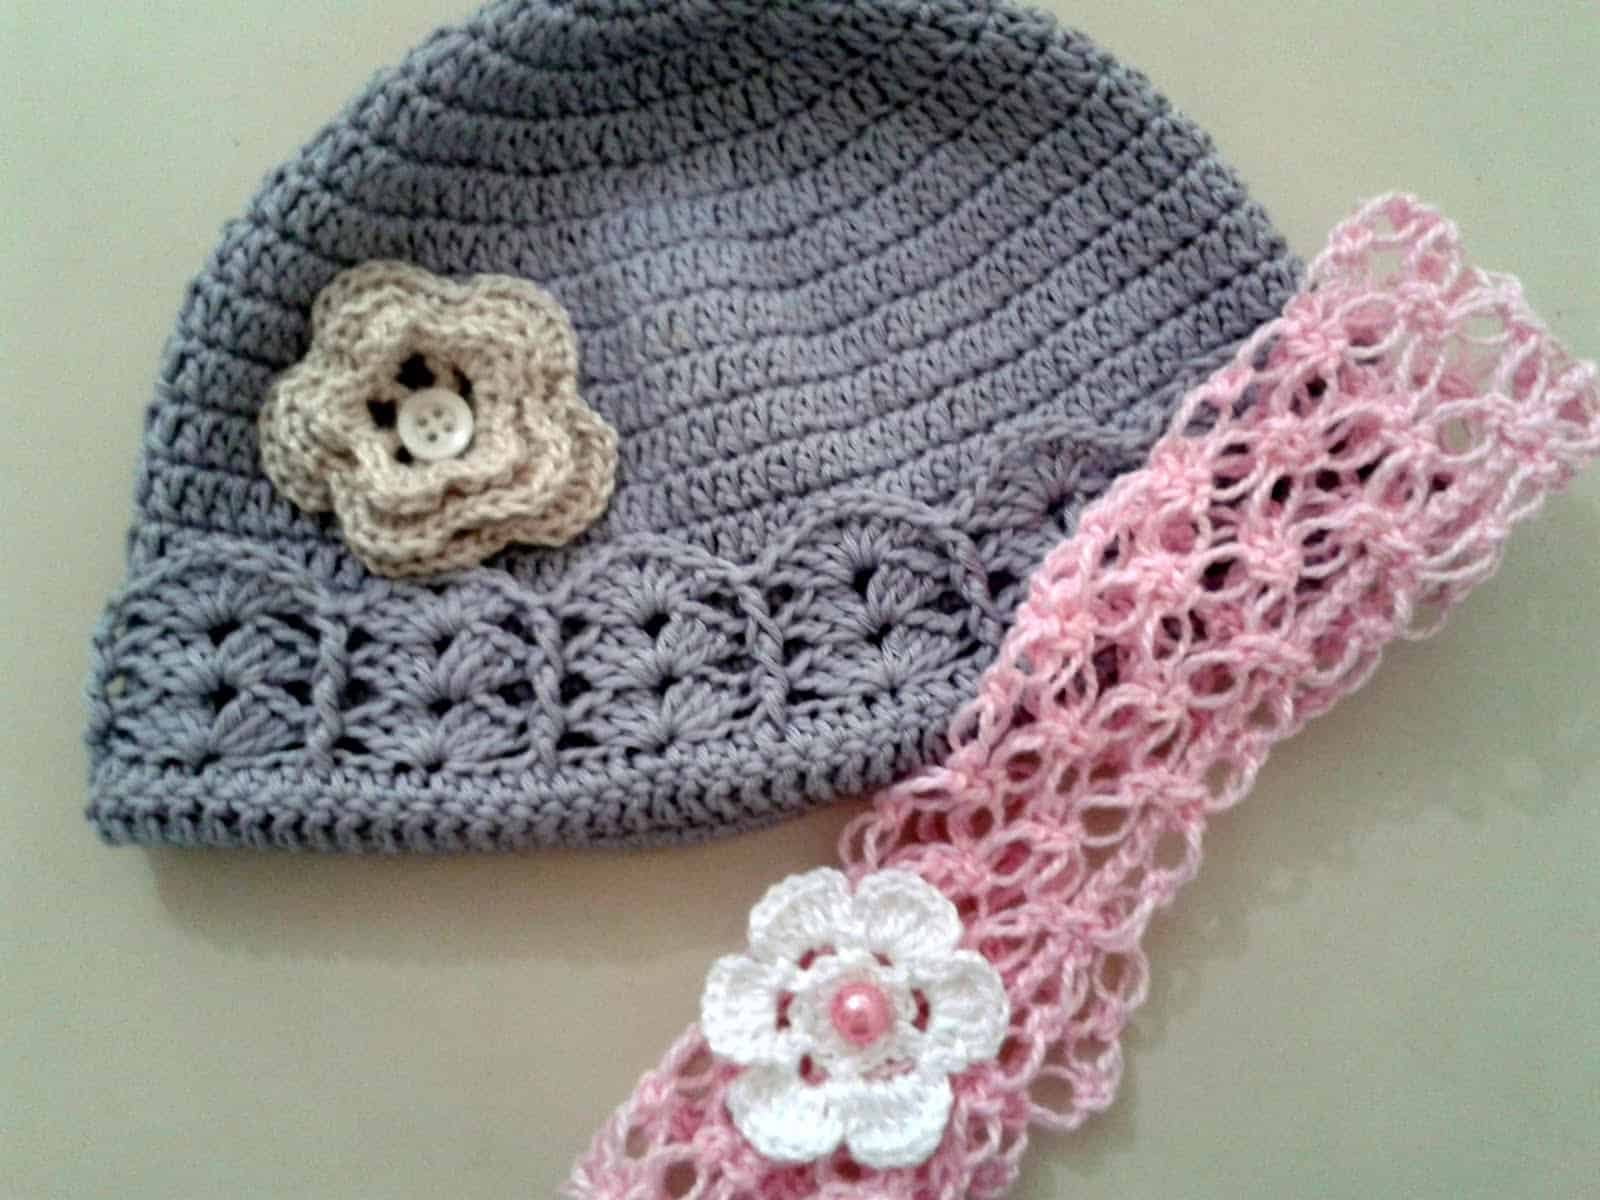 Como fazer flor de crochê: gorros e tiaras